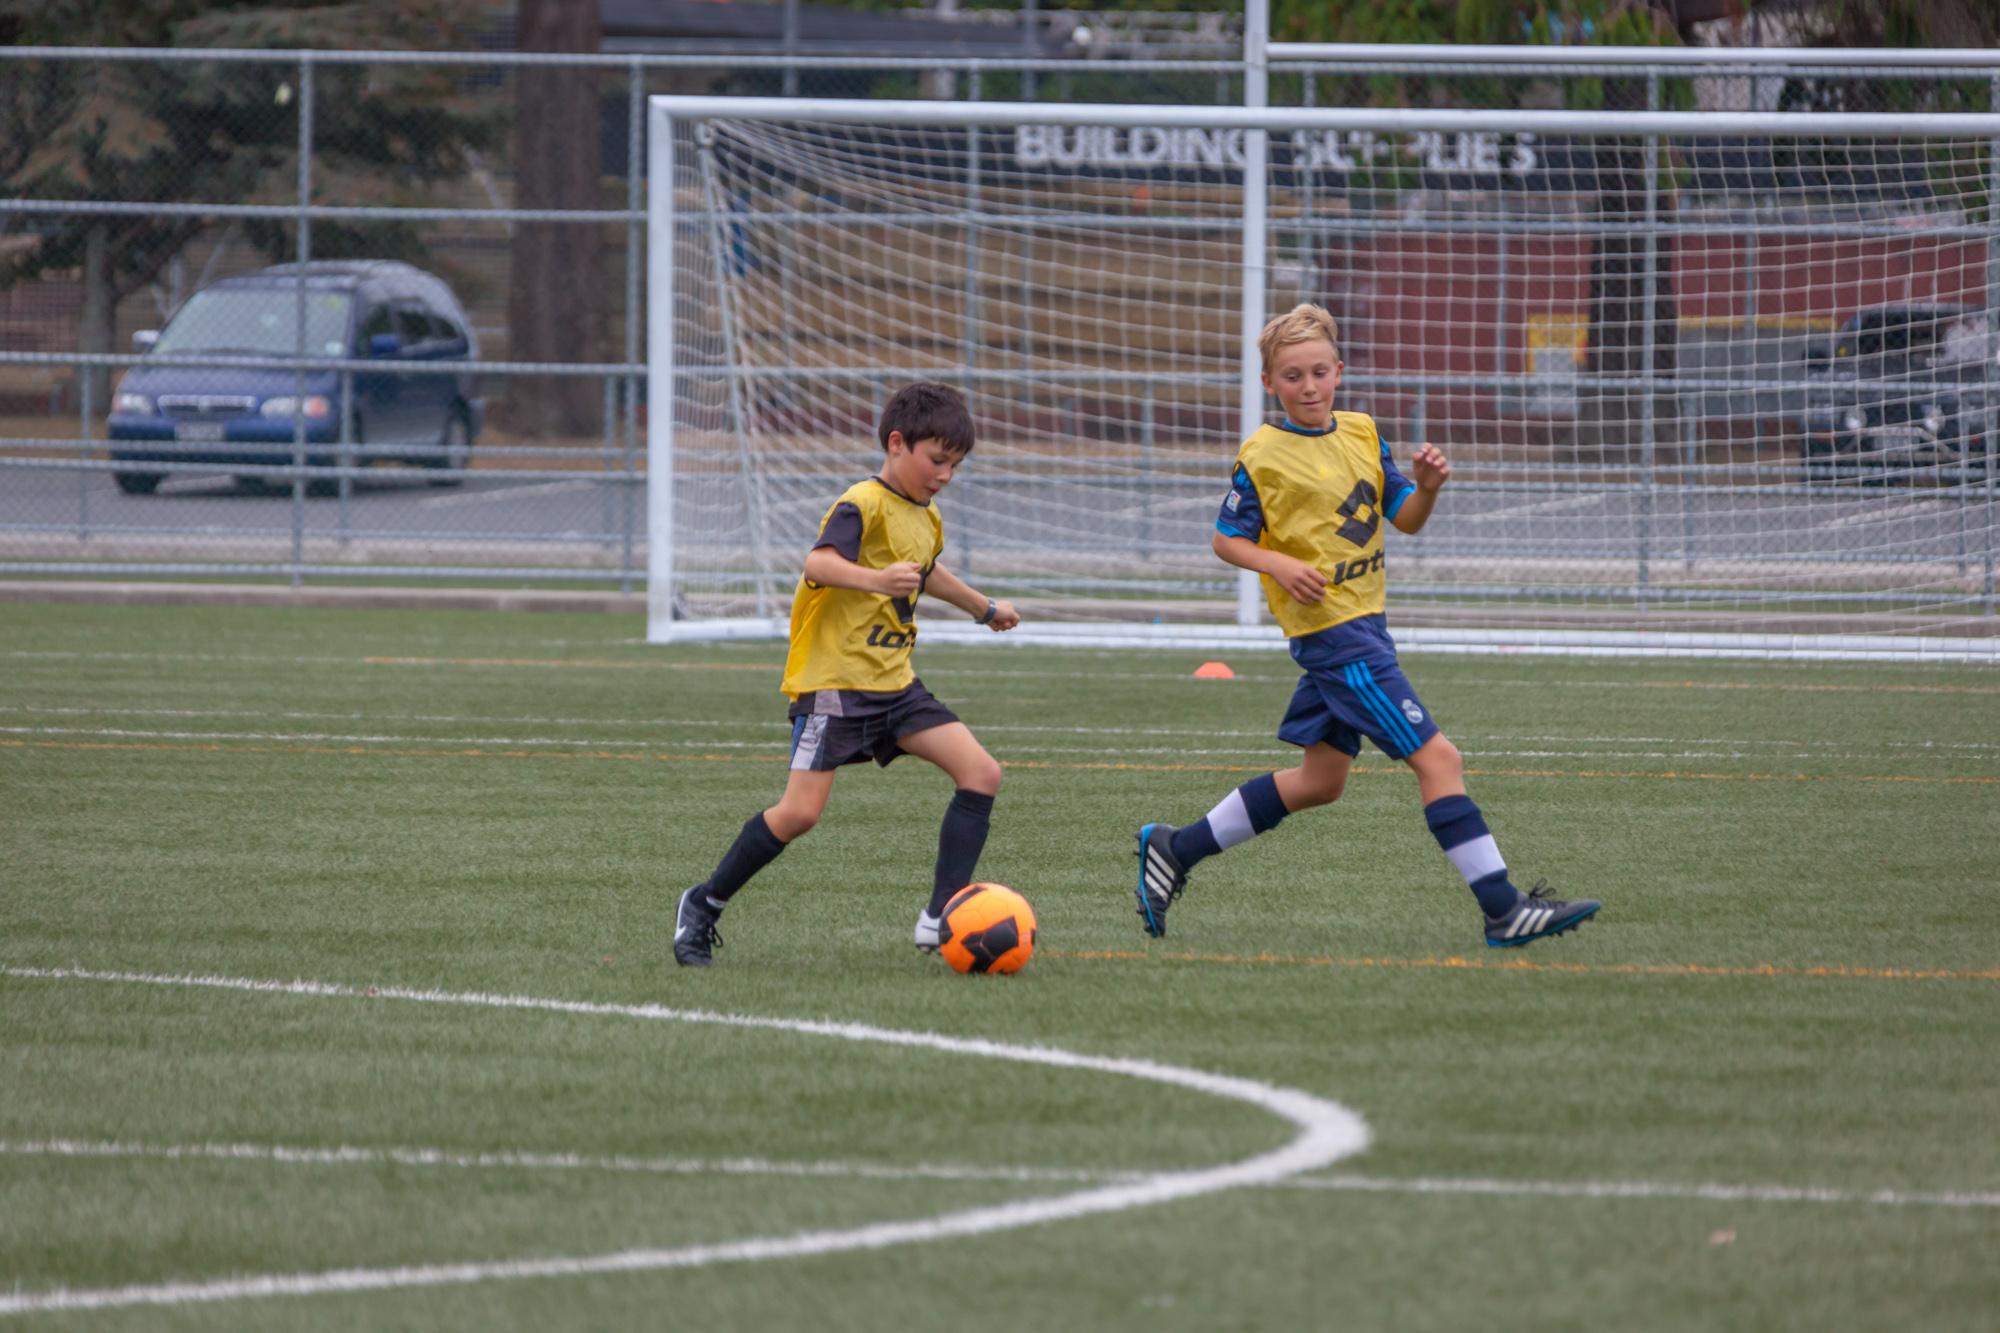 UHCC Soccer Coach 4480